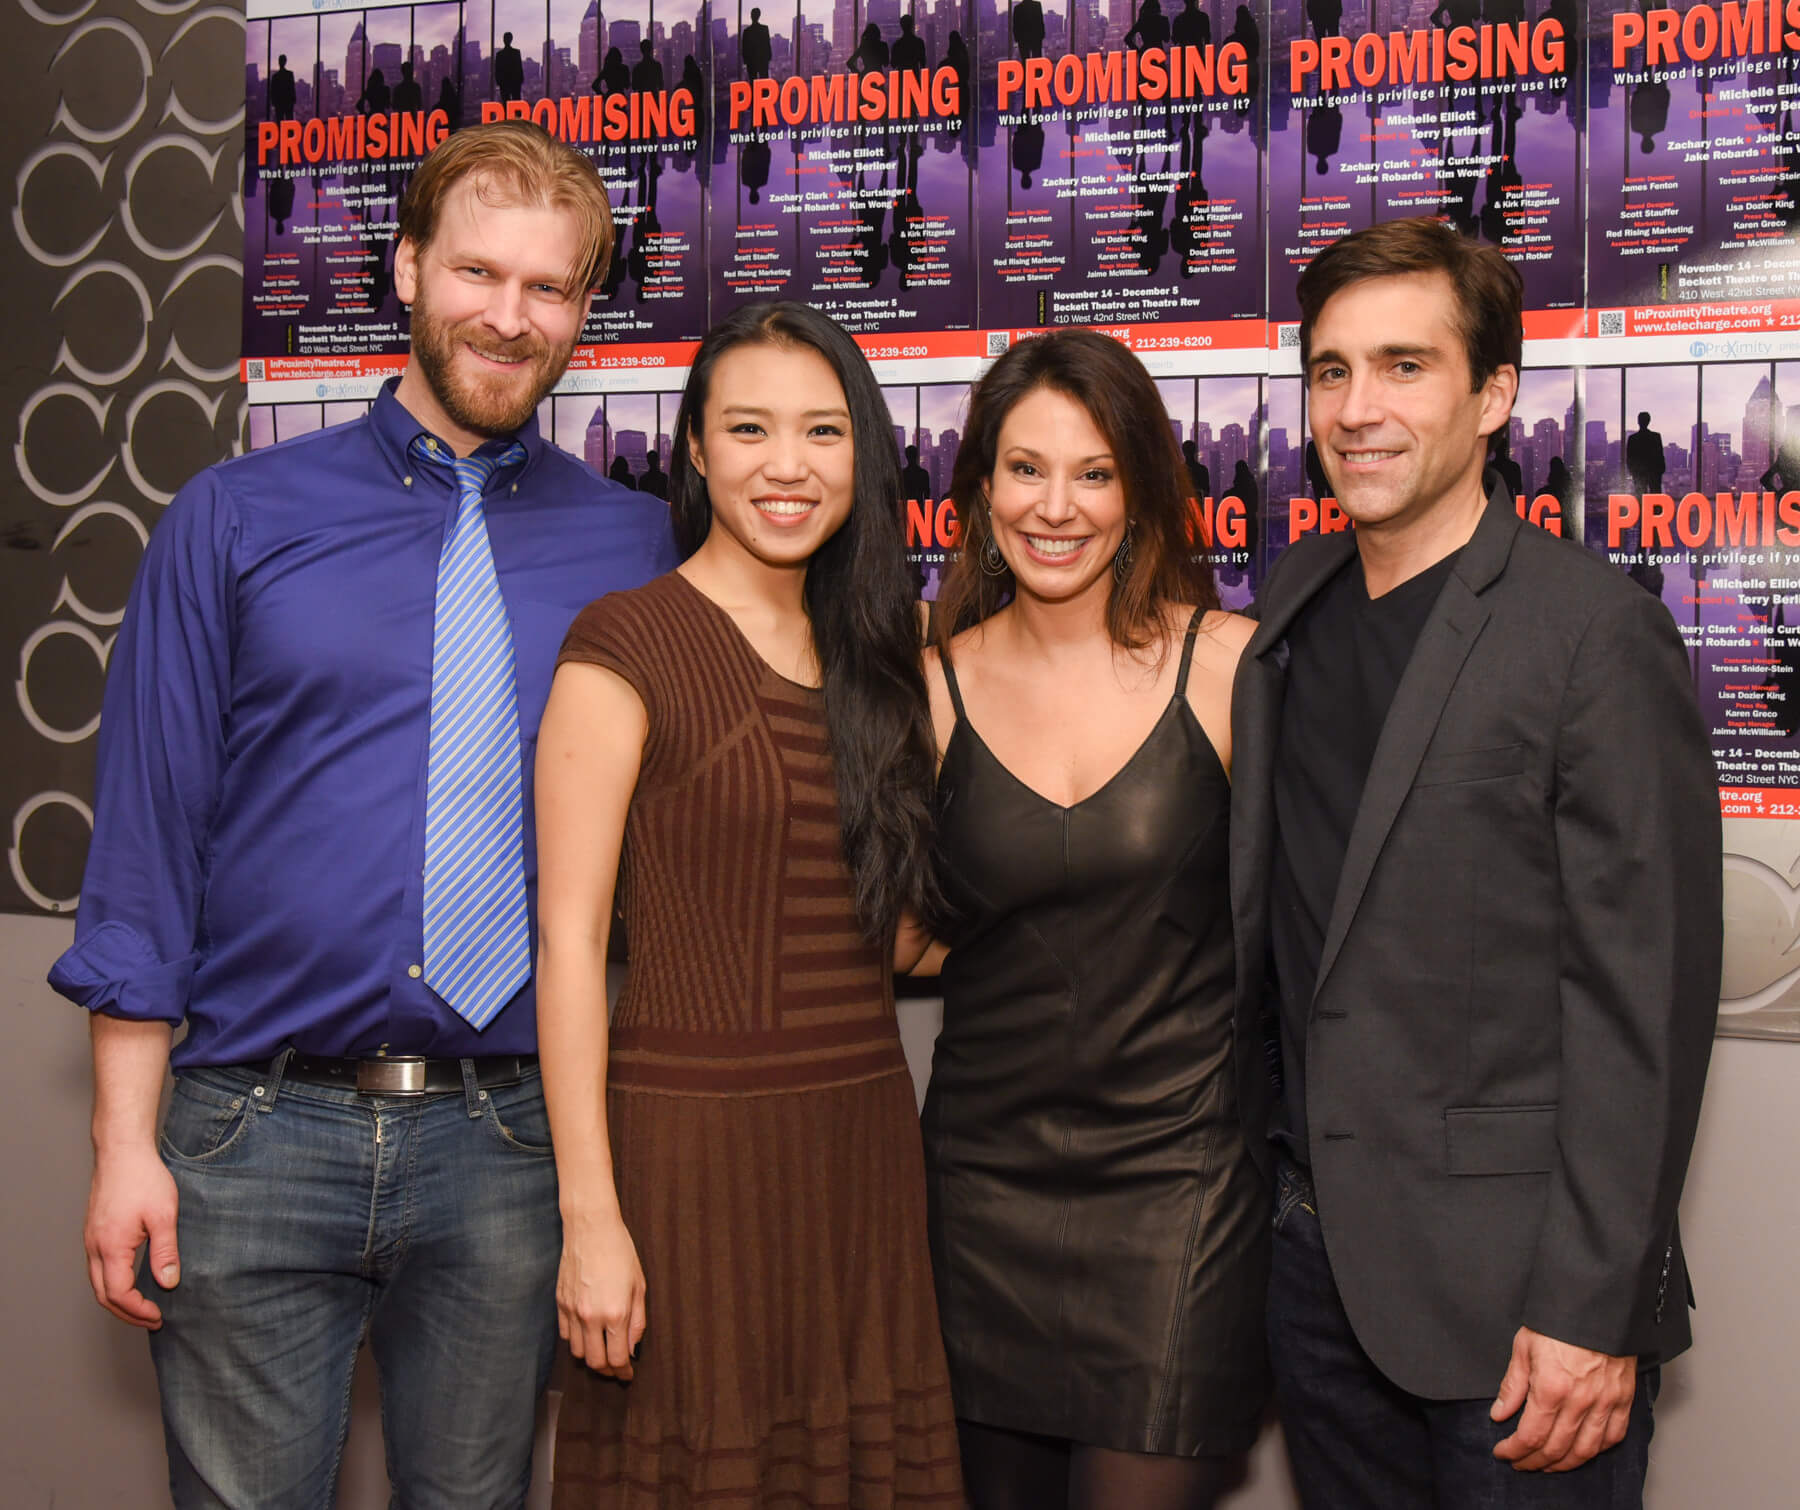 "InProximity Theatre Company ""Promising"" Cast"